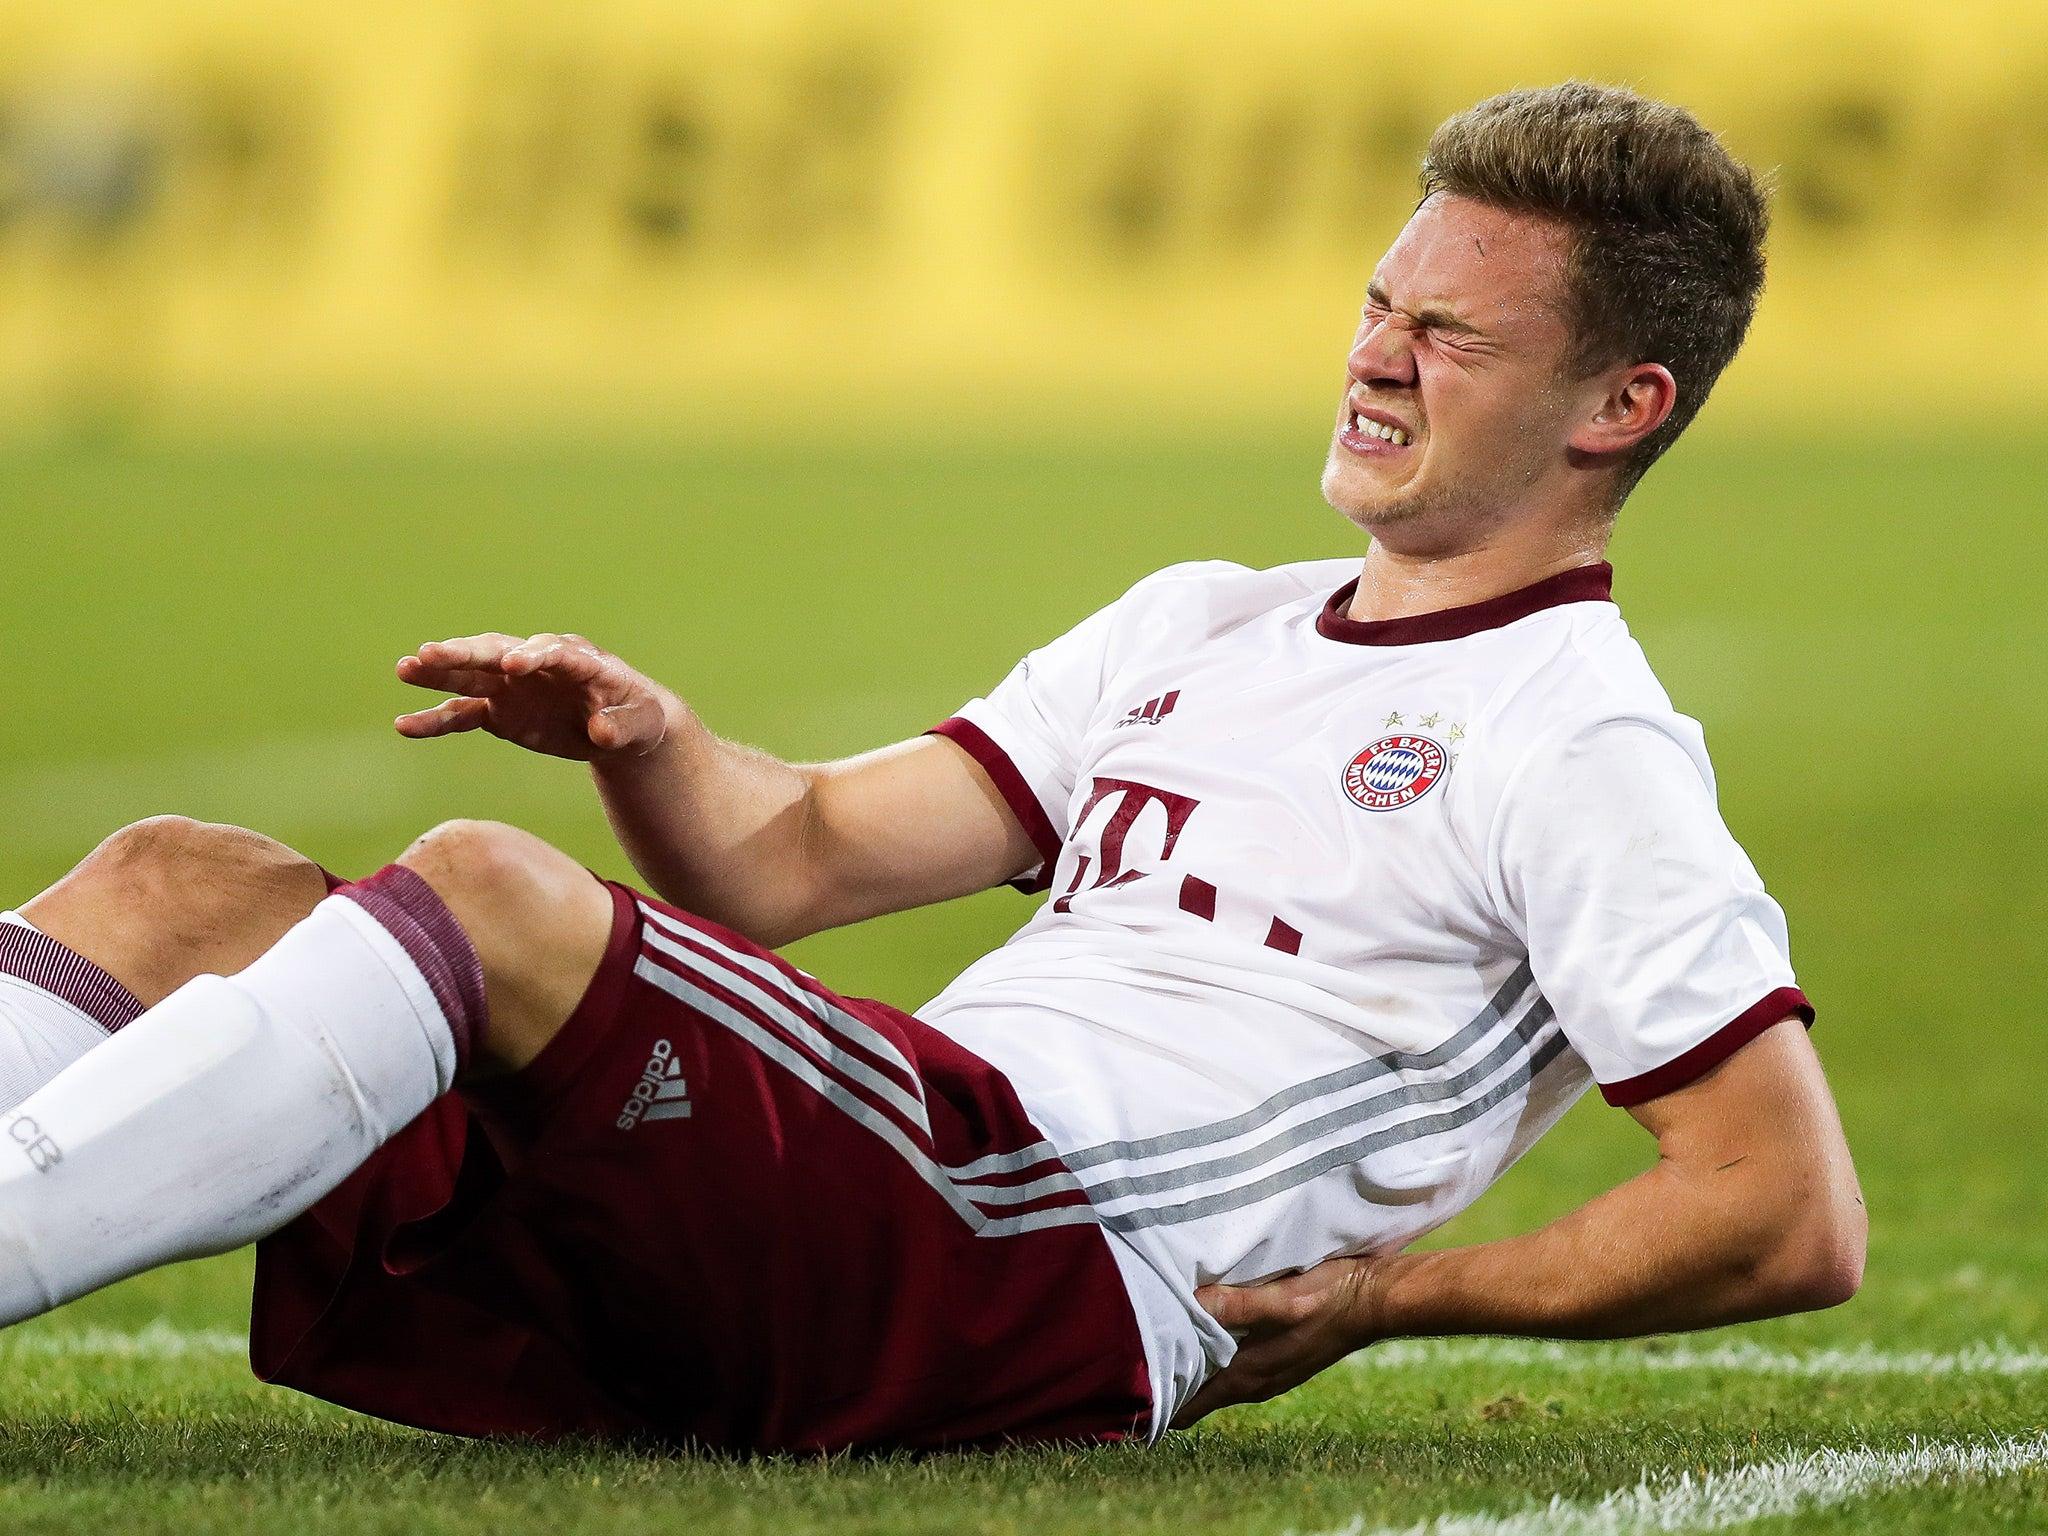 Joshua Kimmich frustrated about lack of Bayern Munich playing time